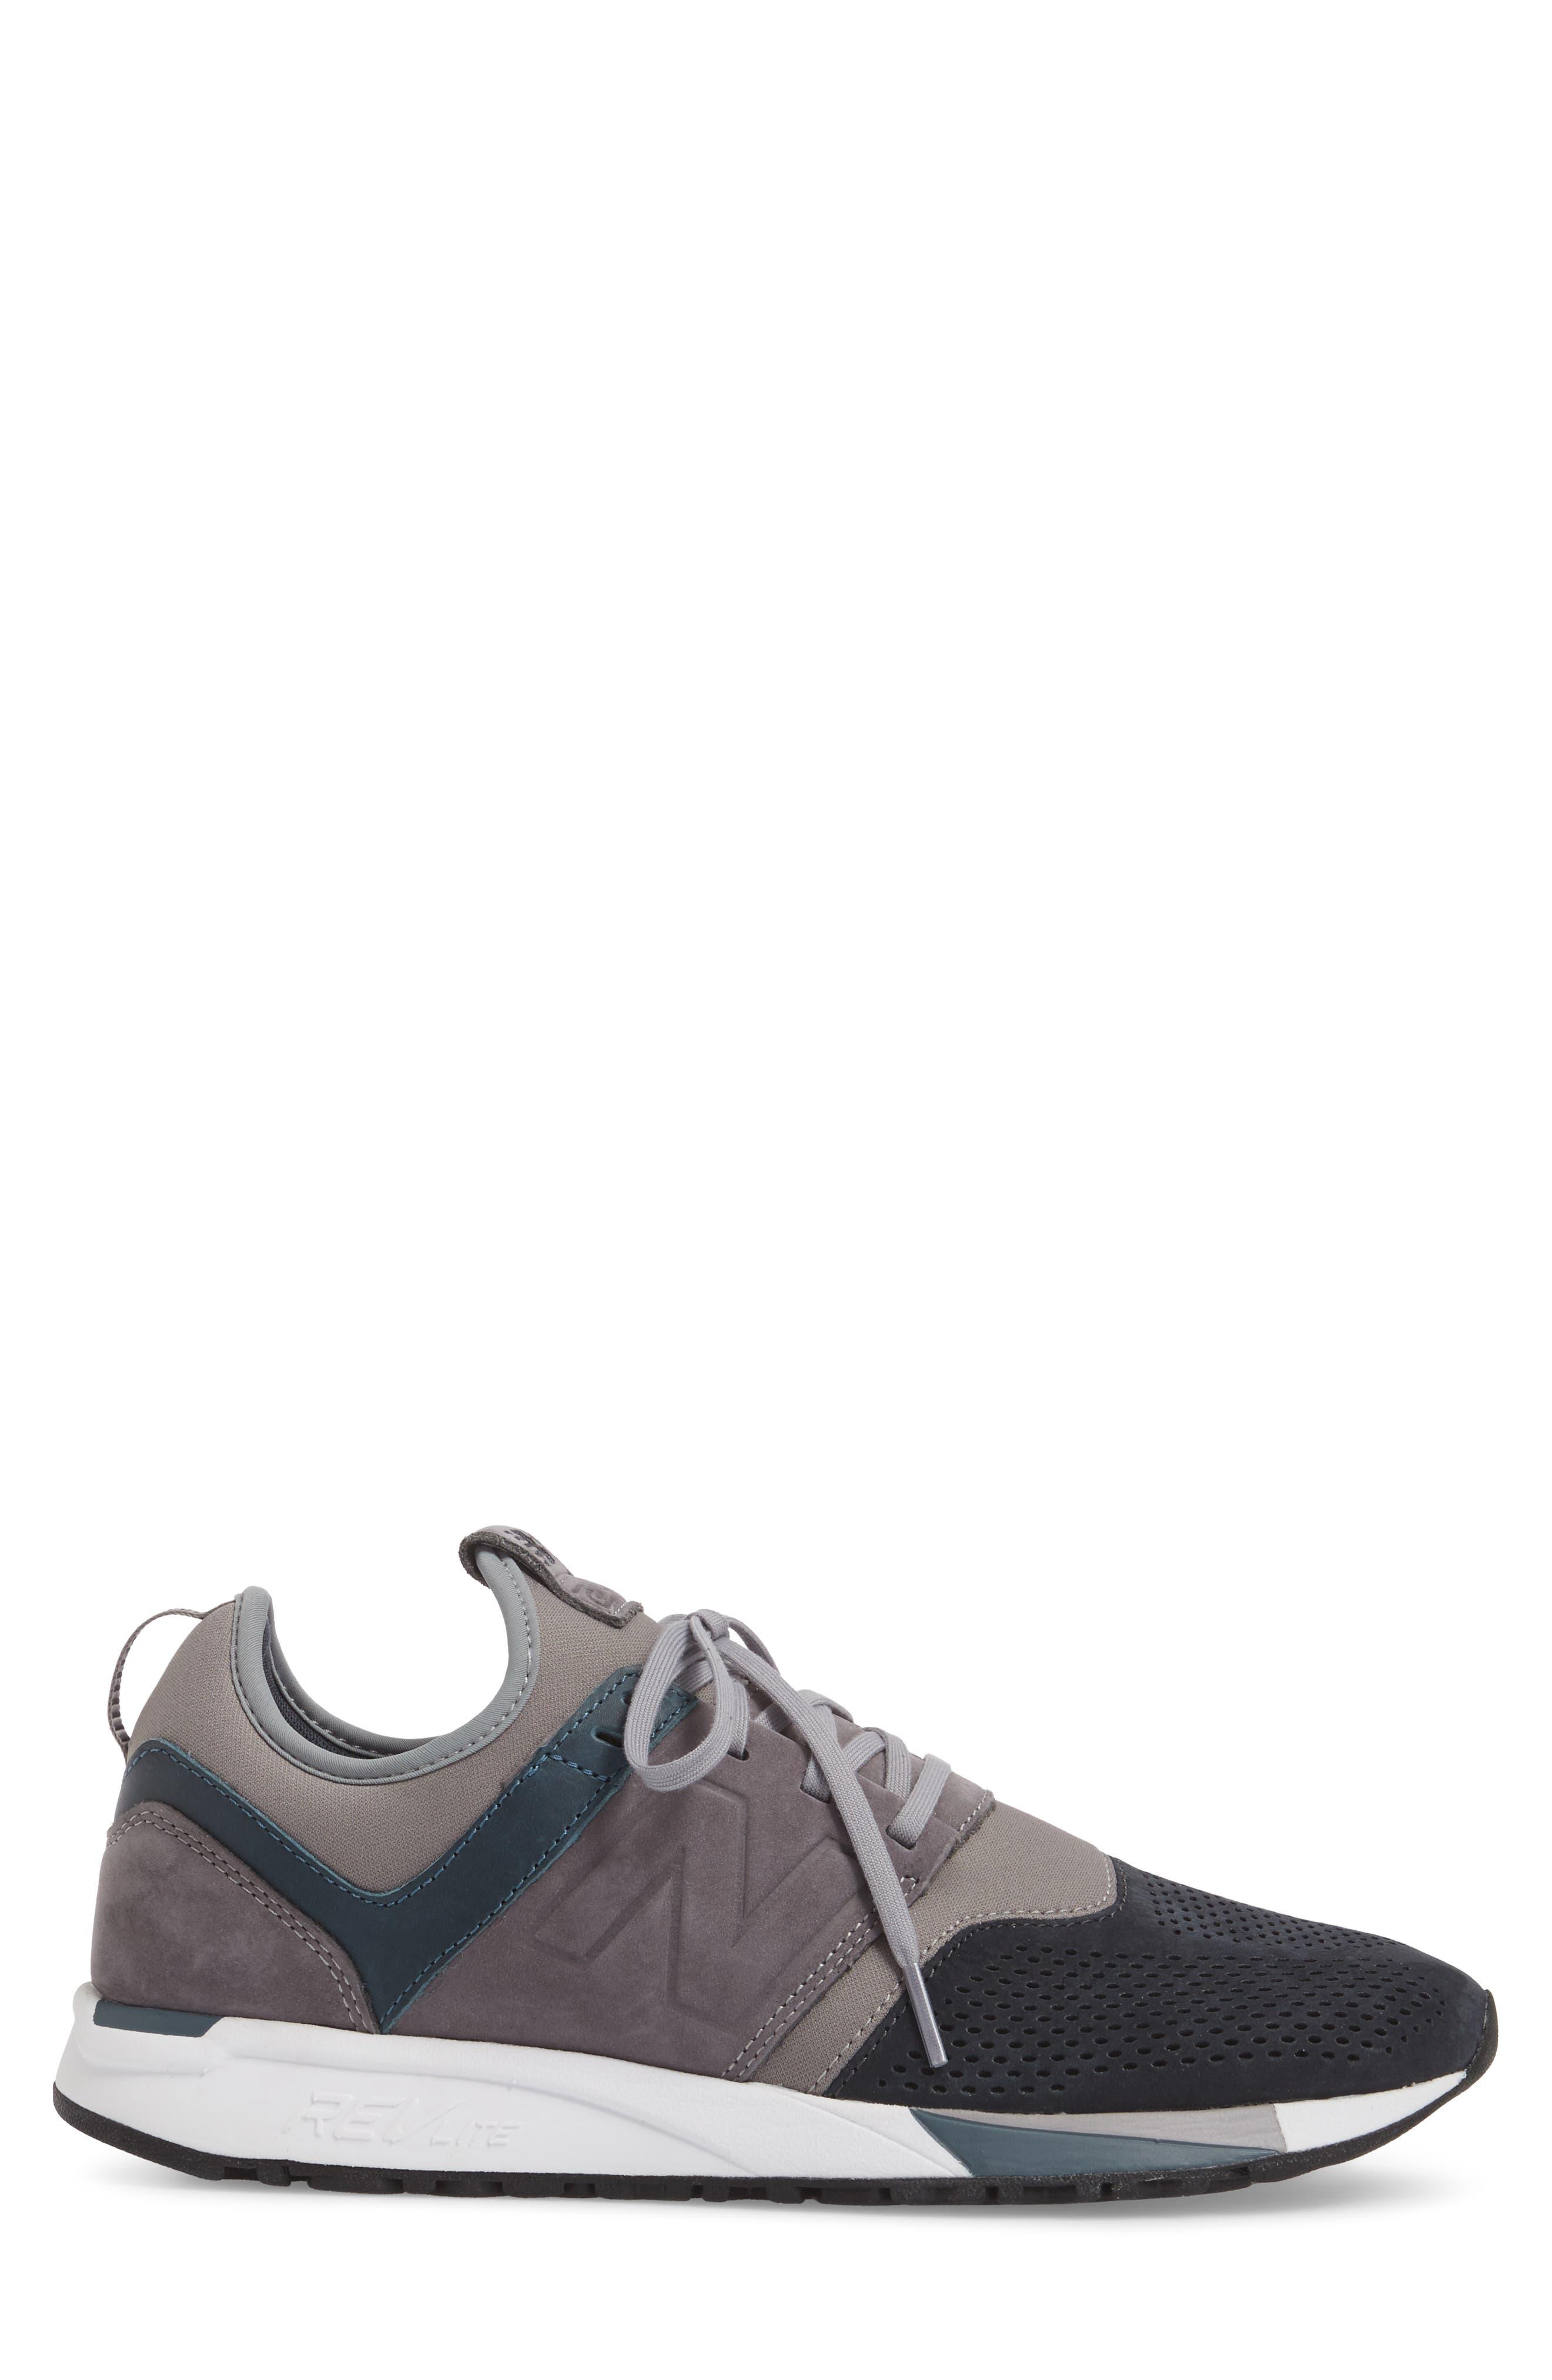 Alternate Image 3  - New Balance 274 Luxe Sneaker (Men)